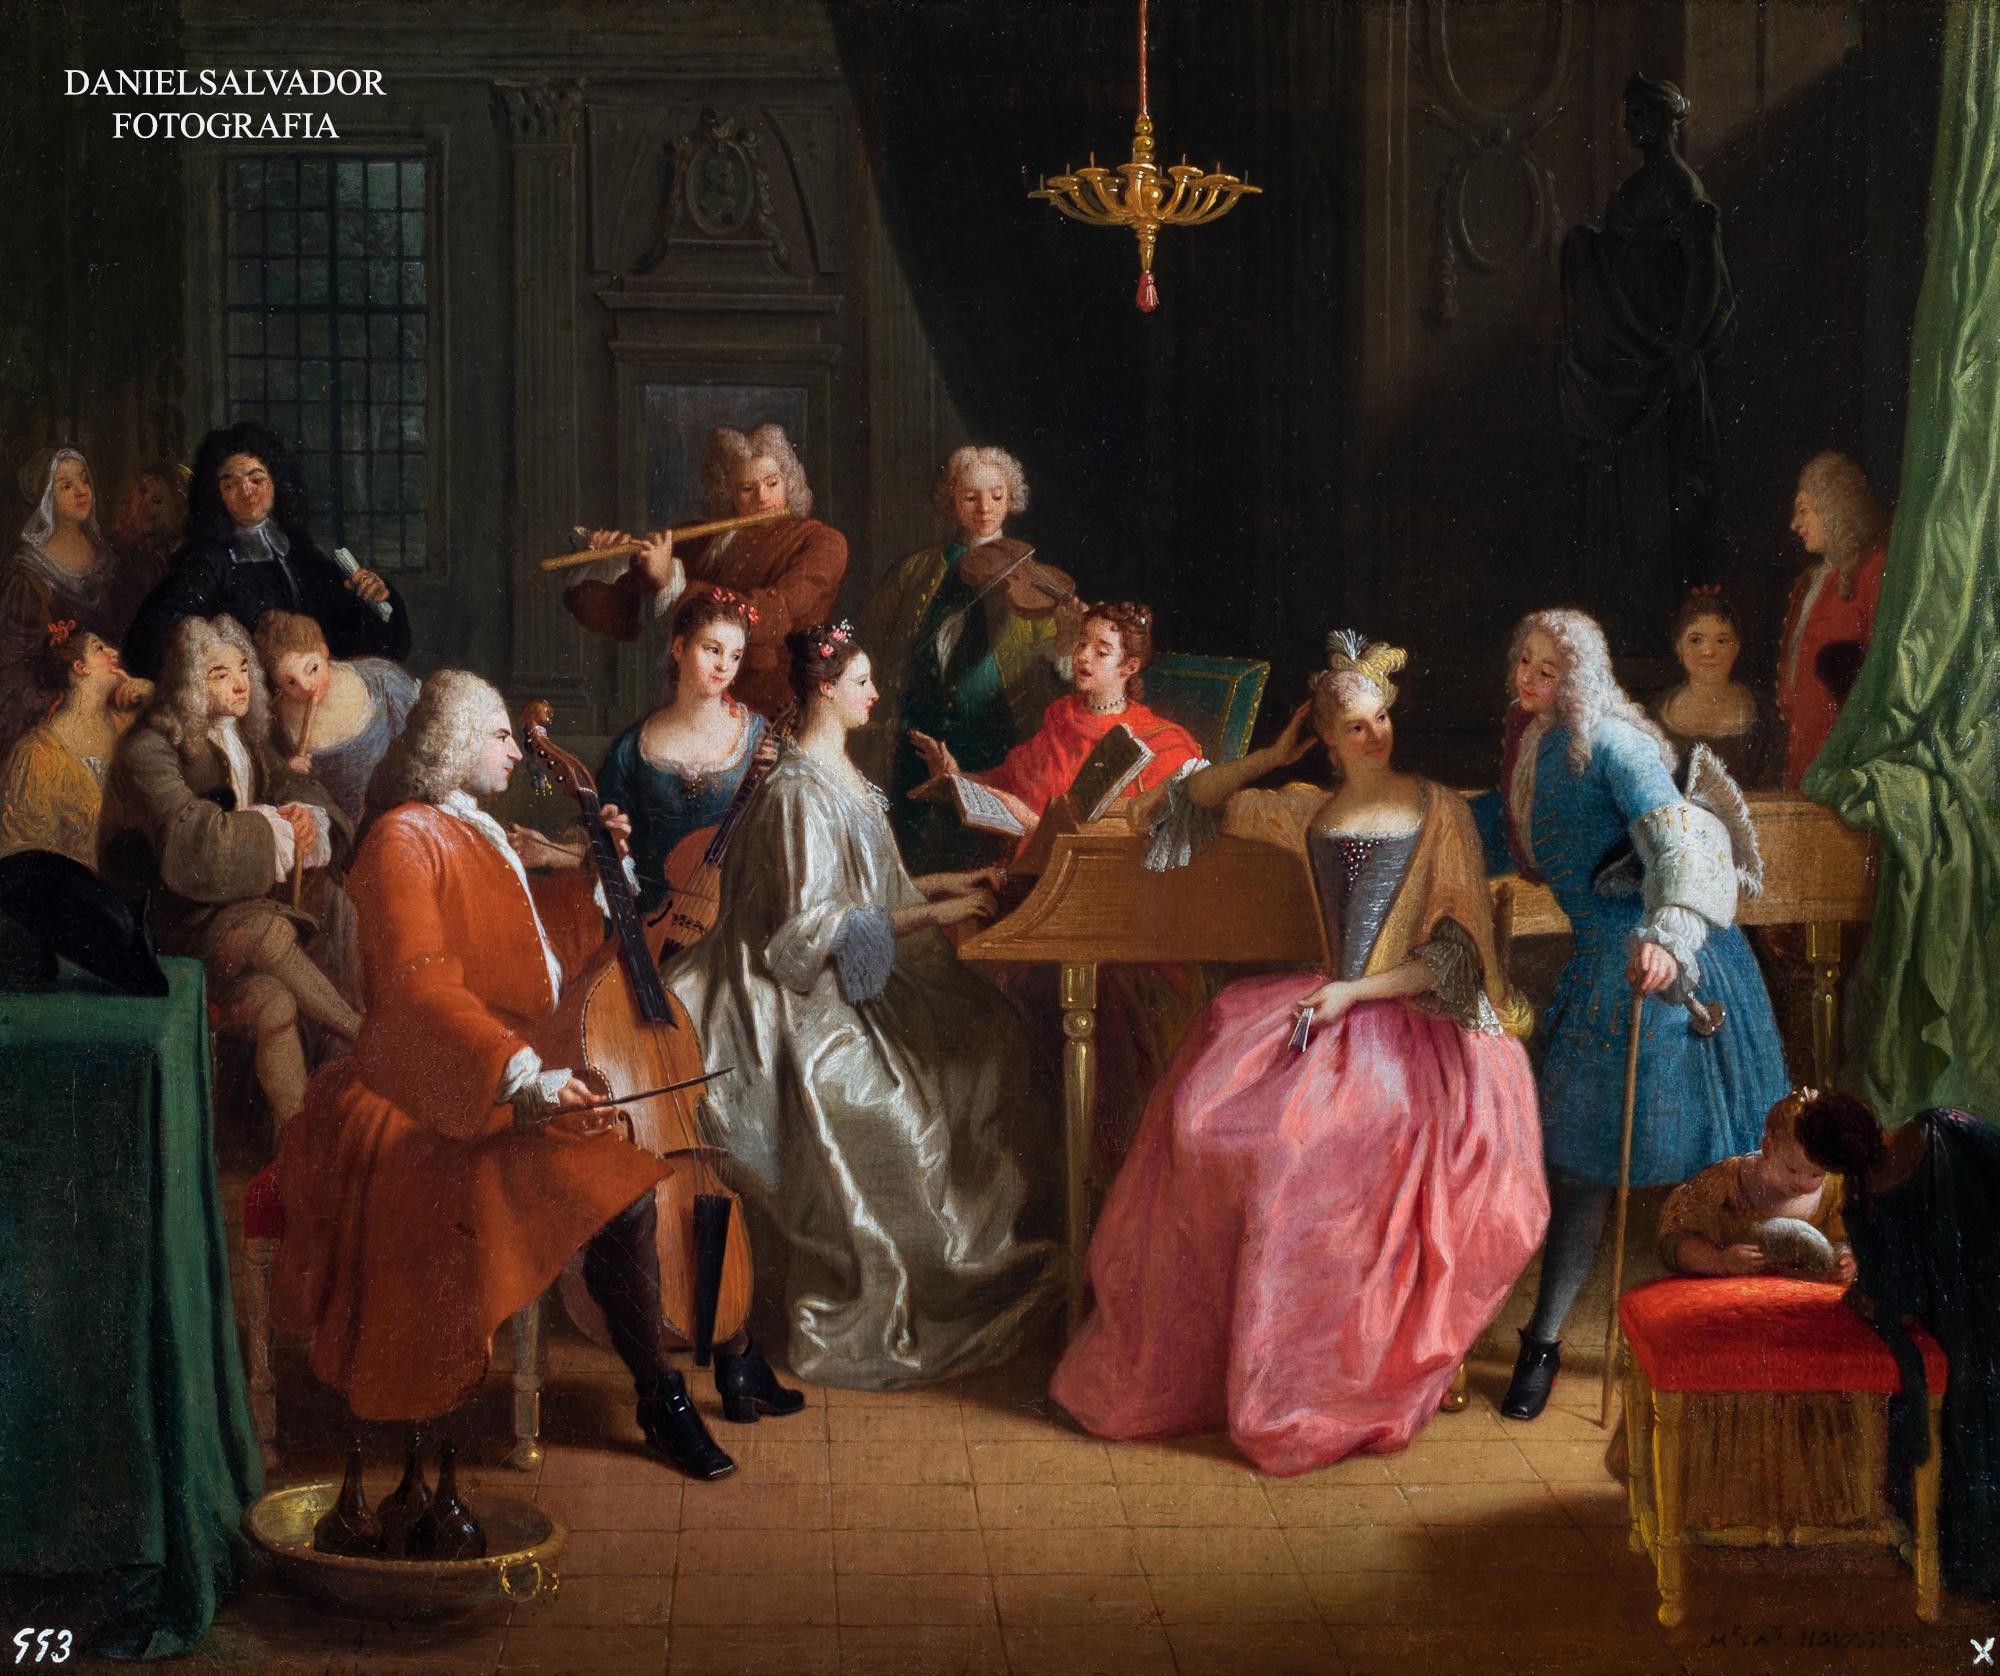 Velada musical. Michael Houasse. Palacio de la Granja de San Ildefonso